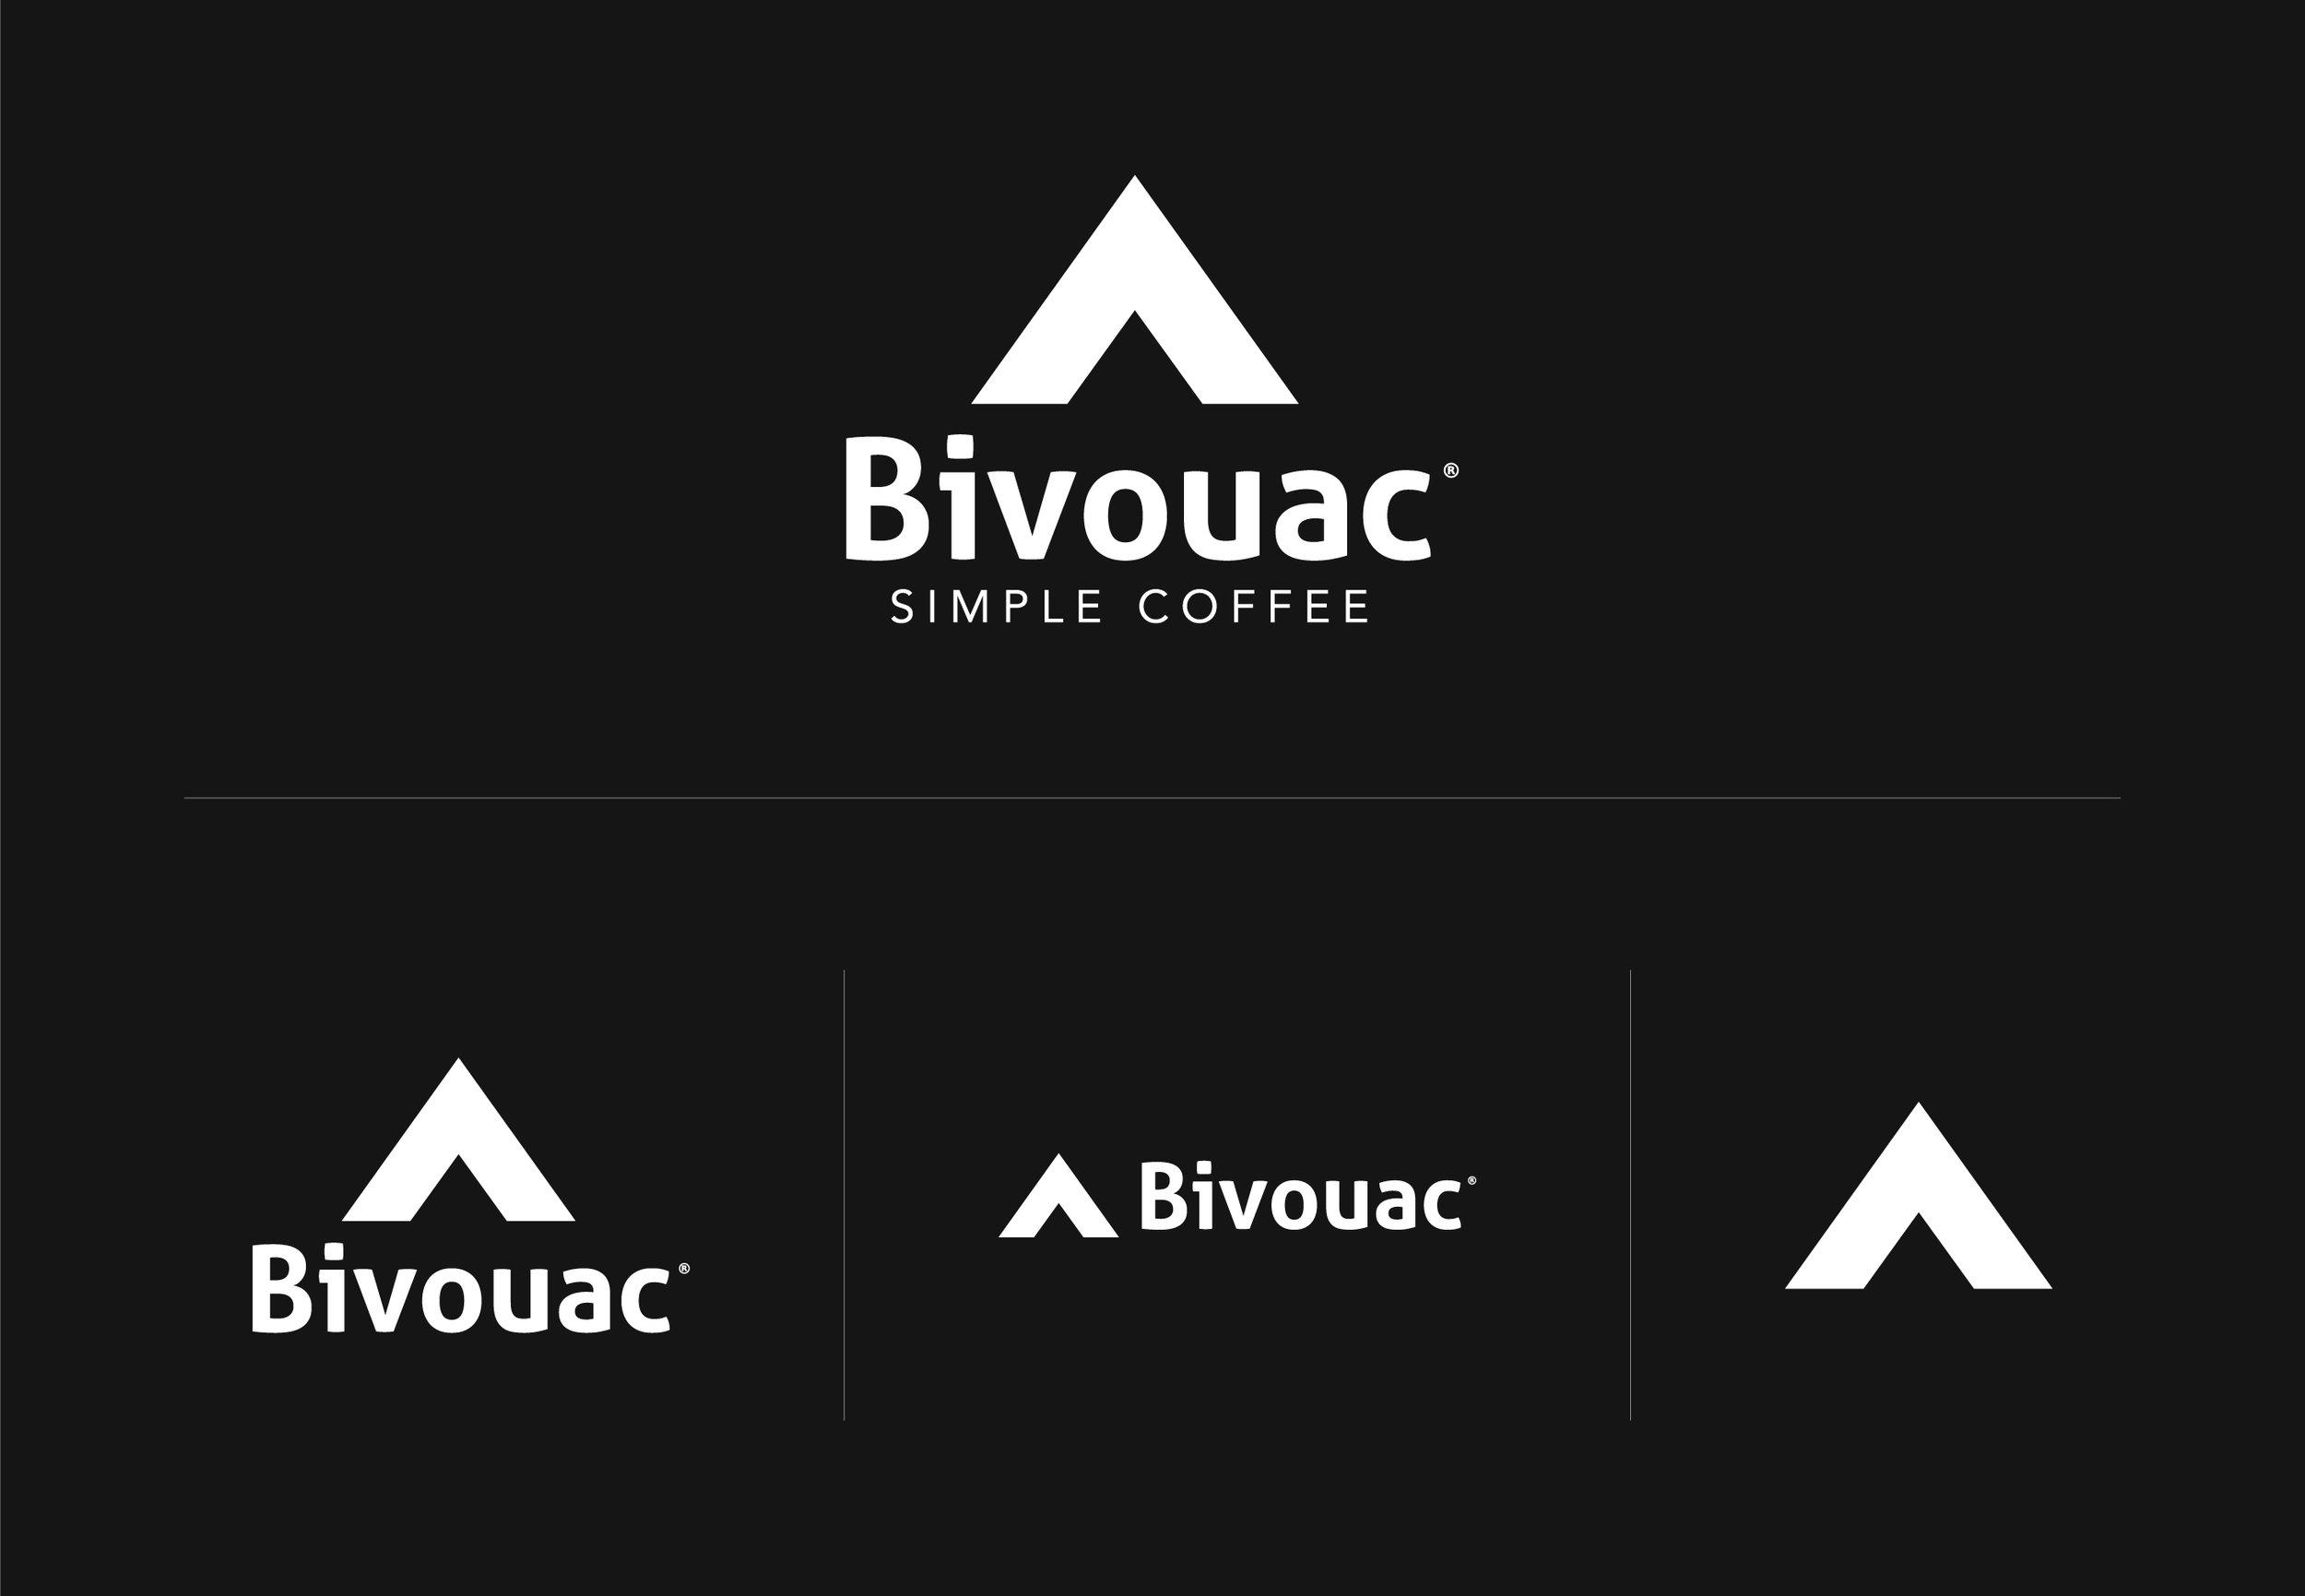 bivouac_logo_variations.jpg